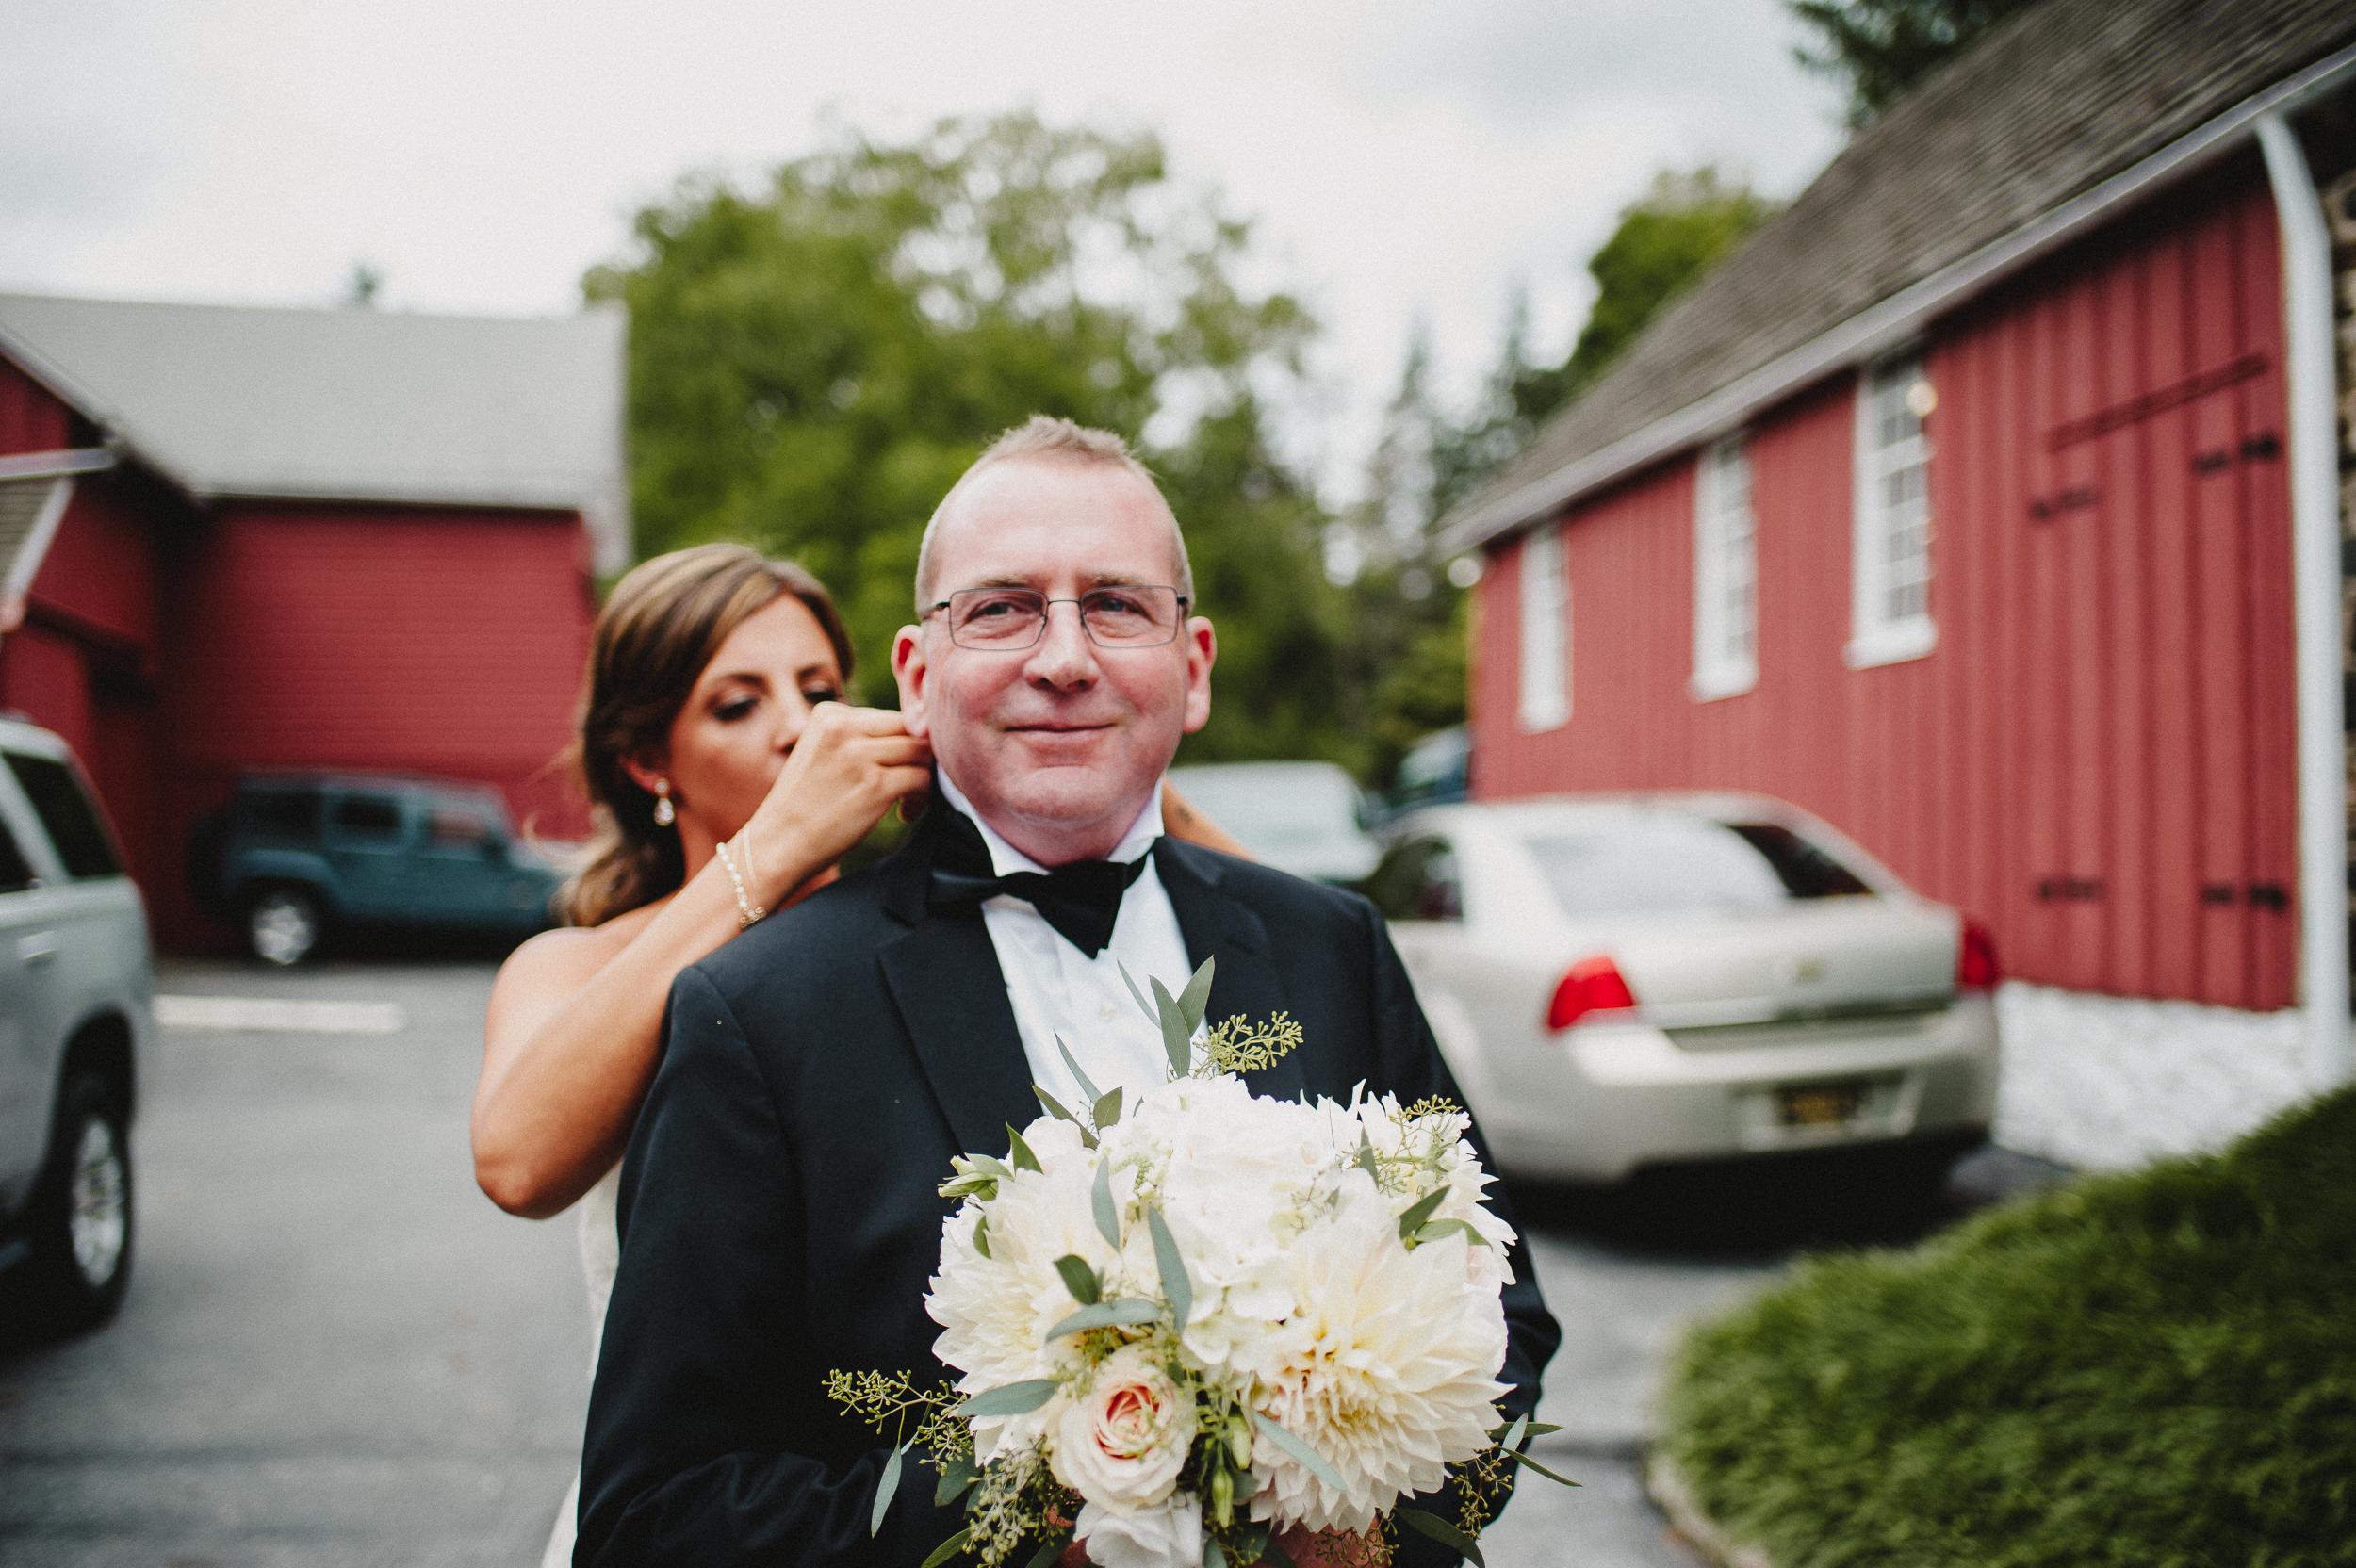 delaware-estate-wedding-photographer-pat-robinson-photography-42.jpg